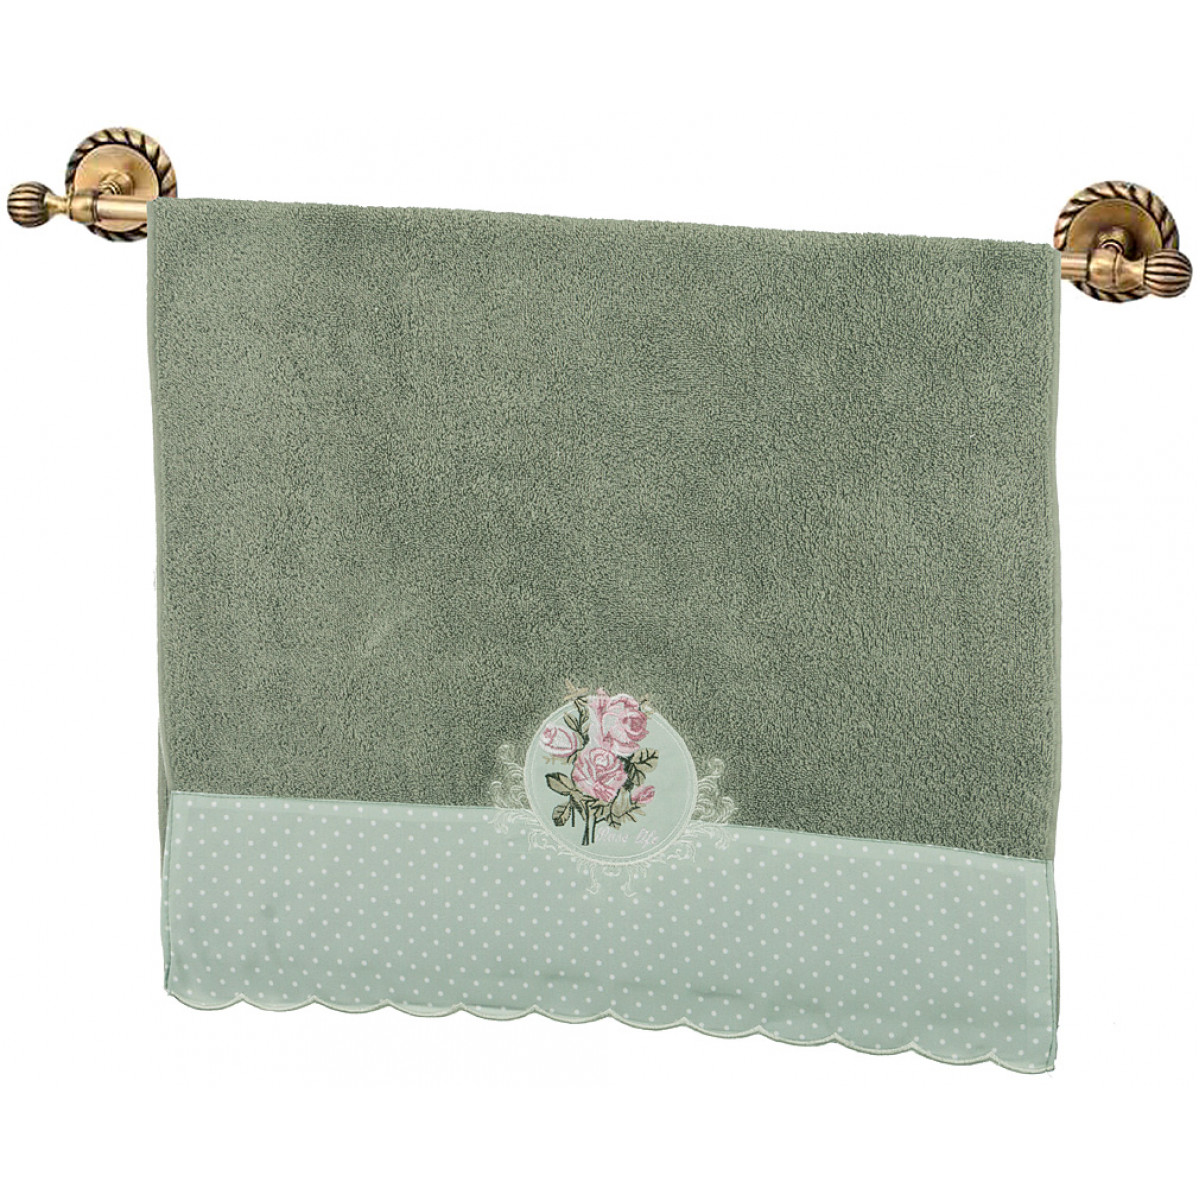 Полотенца Santalino Полотенце Clinton  (50х90 см) полотенце денастия полотенце денастия 50х90 см хлопок